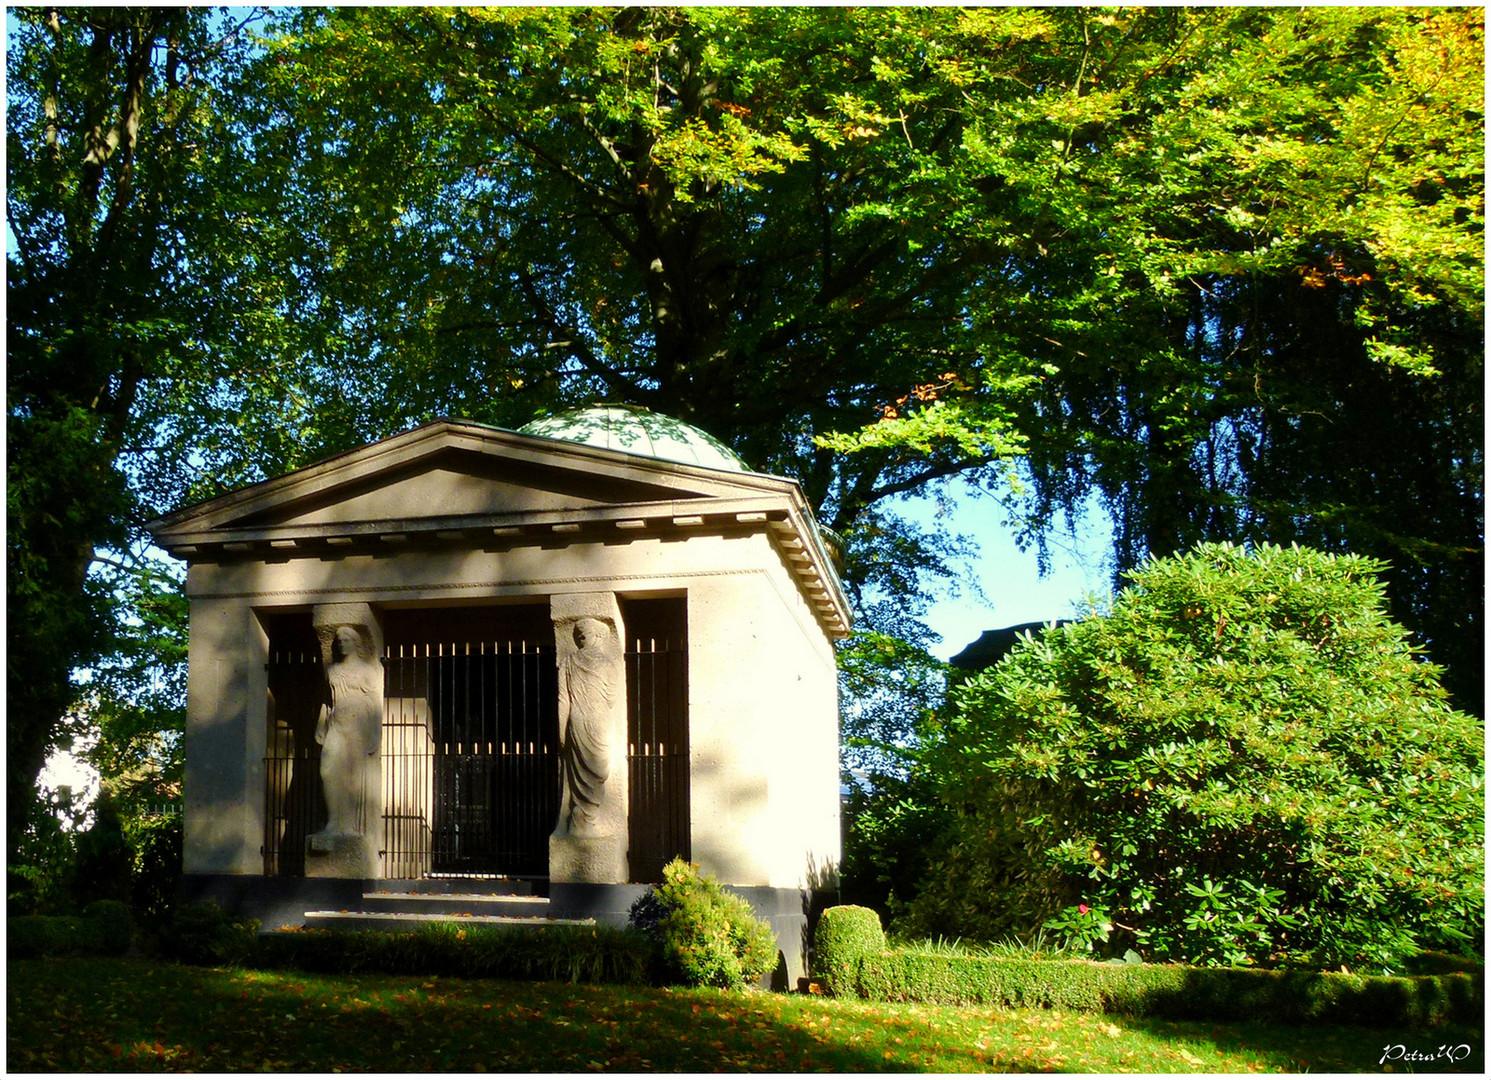 7 Ohlsdorfer Friedhof, Hamburg - Mausoleum